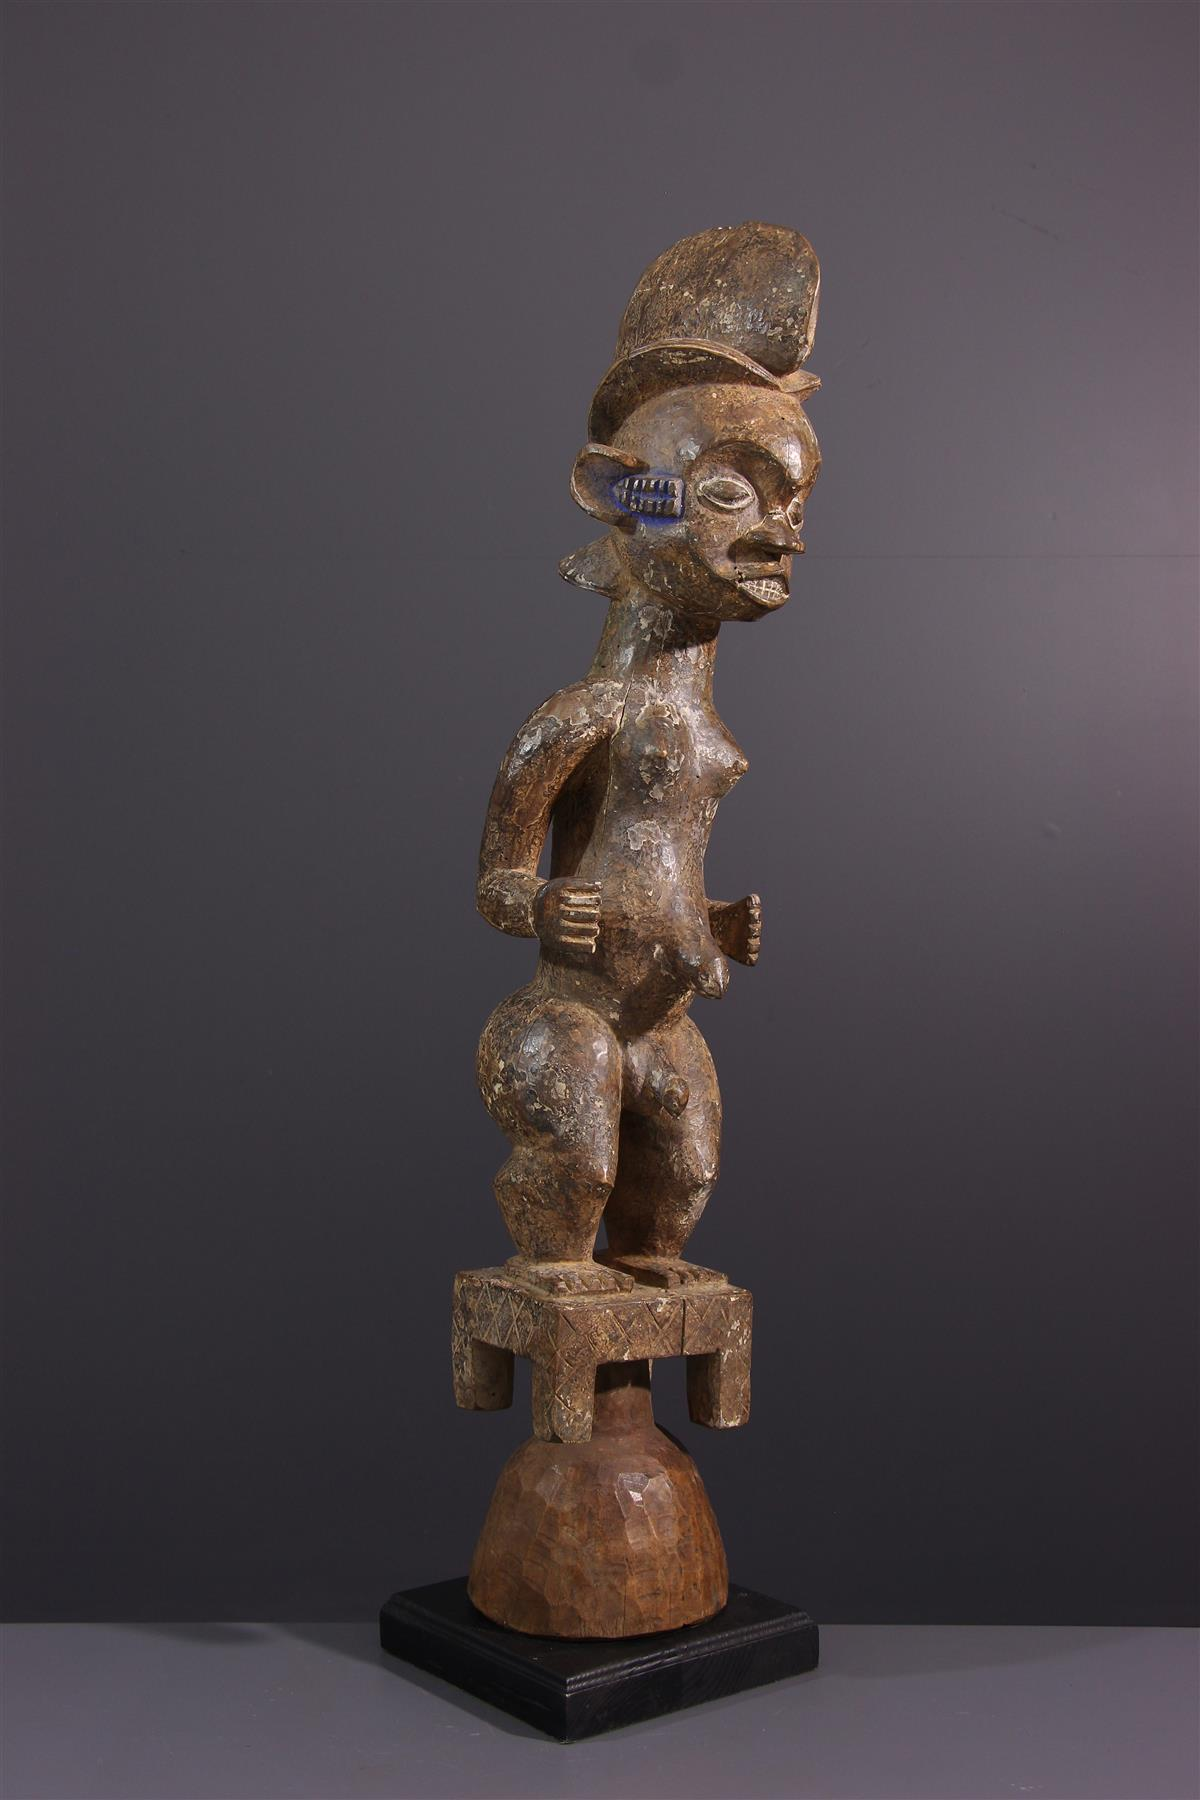 Masque Igbo - Art tribal